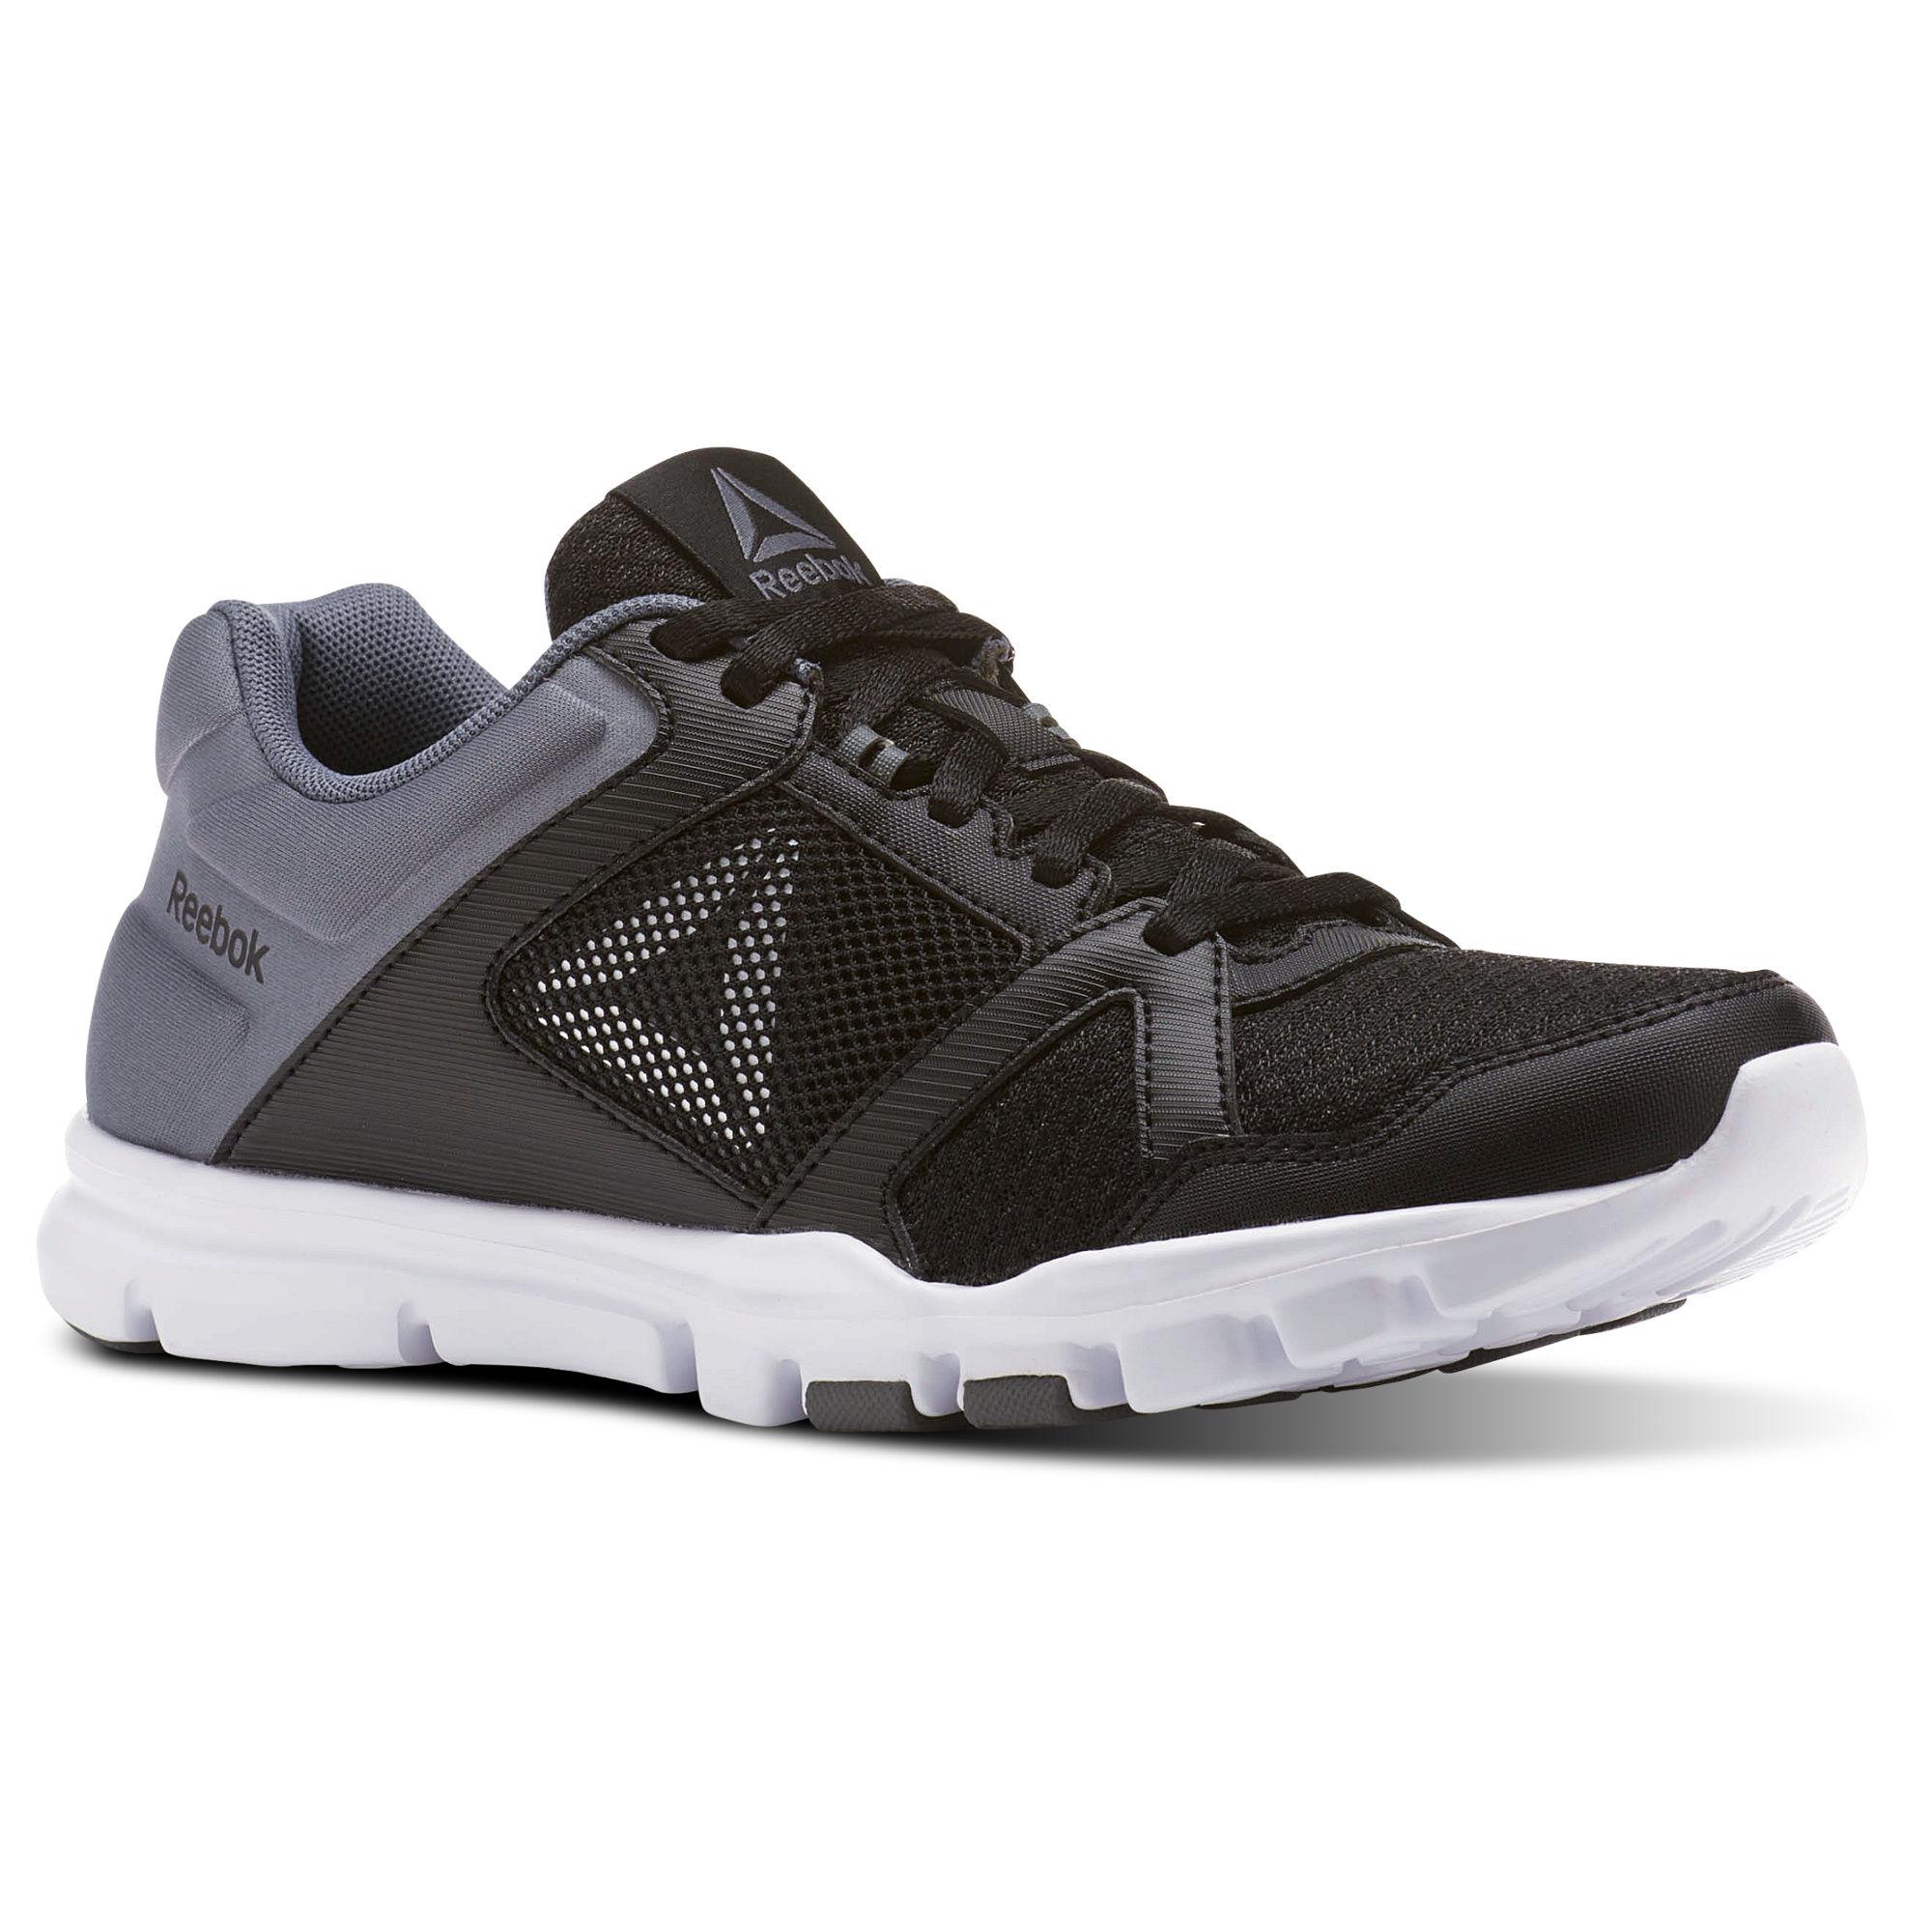 218a141528a1 Reebok Women s Yourflex Trainette 10 Shoes (size 6.5